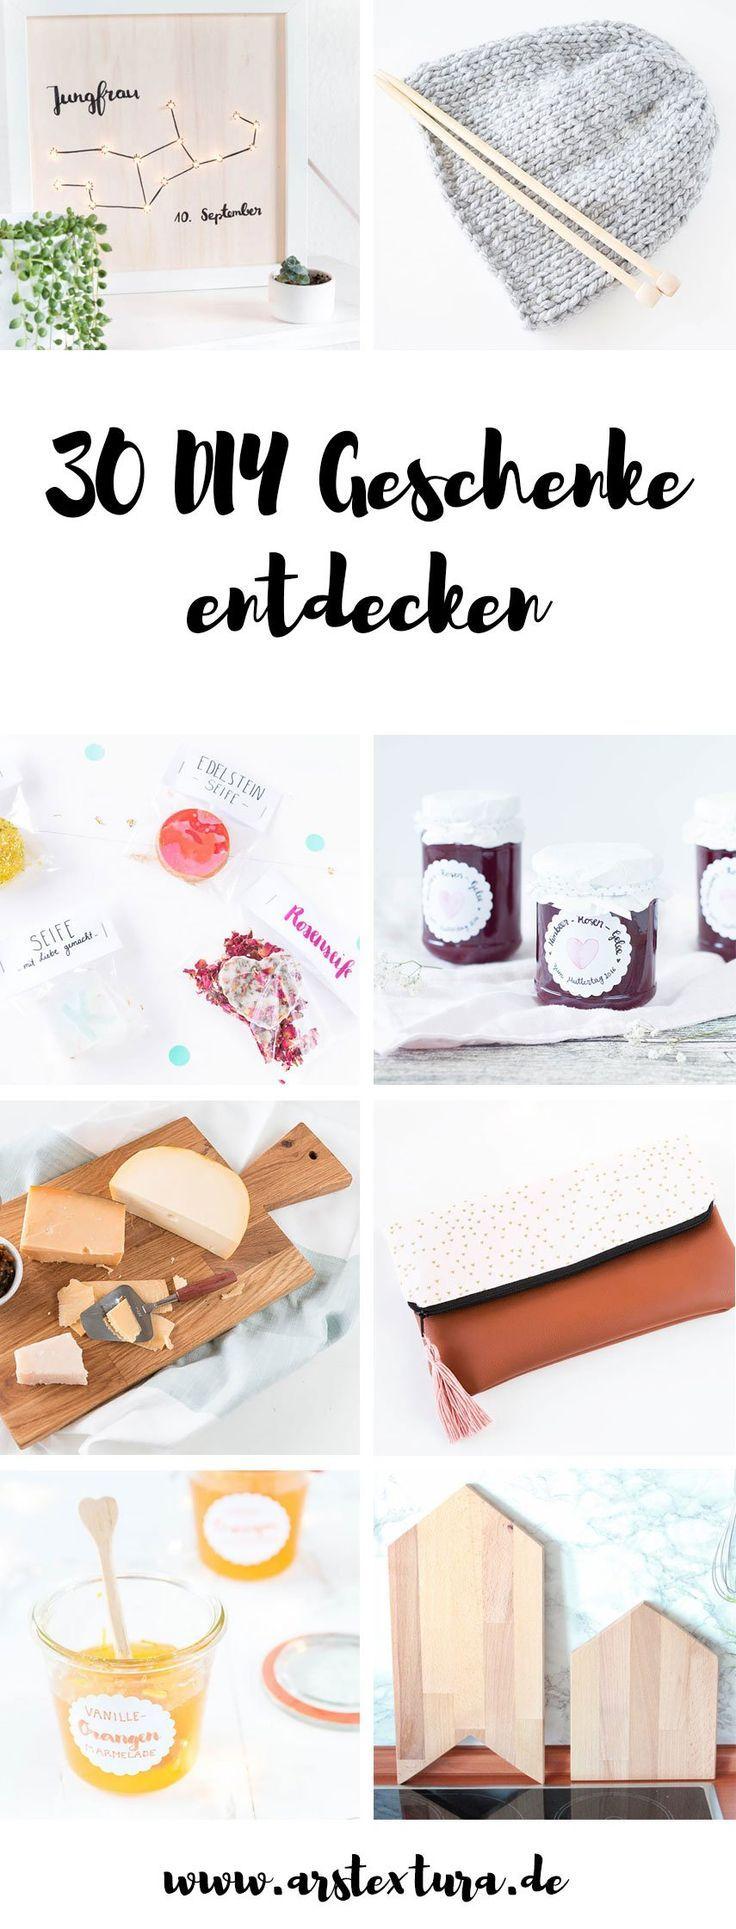 DIY Geschenke   ars textura – DIY-Blog -   diy Tumblr gifts